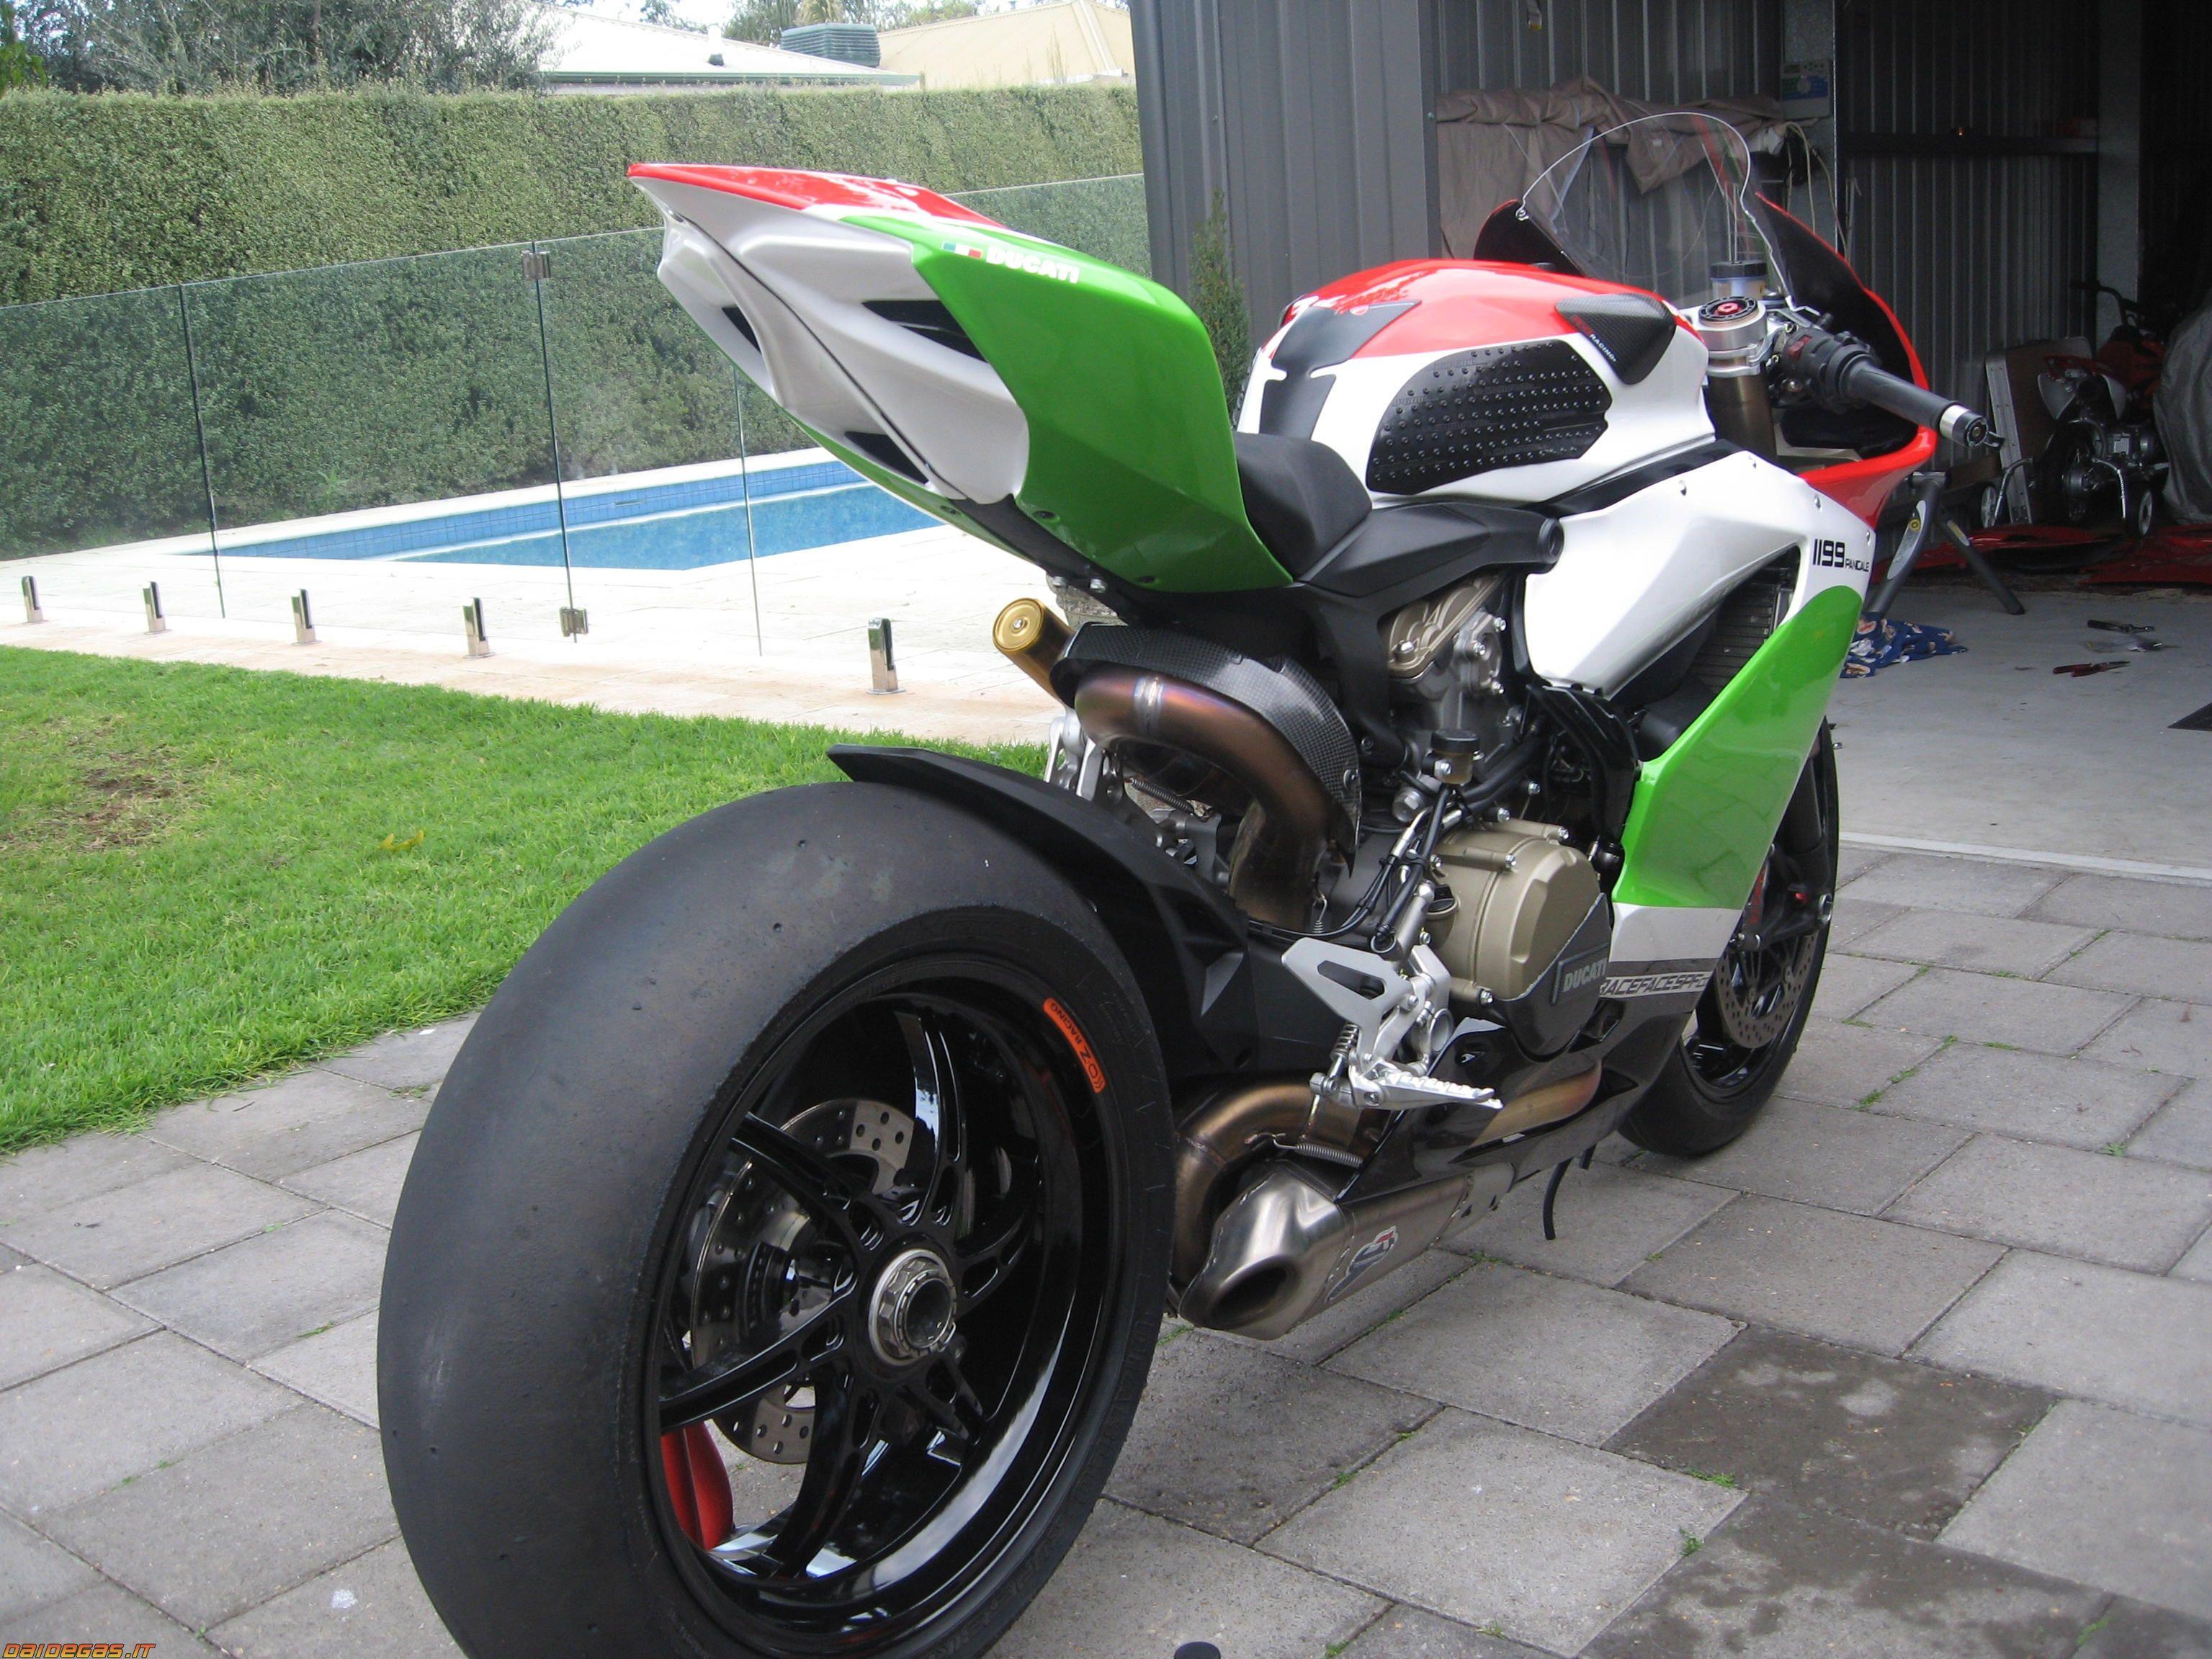 Ducati 1198s Racing Sport Bike: Ducati 1199 Panigale Racing Spec